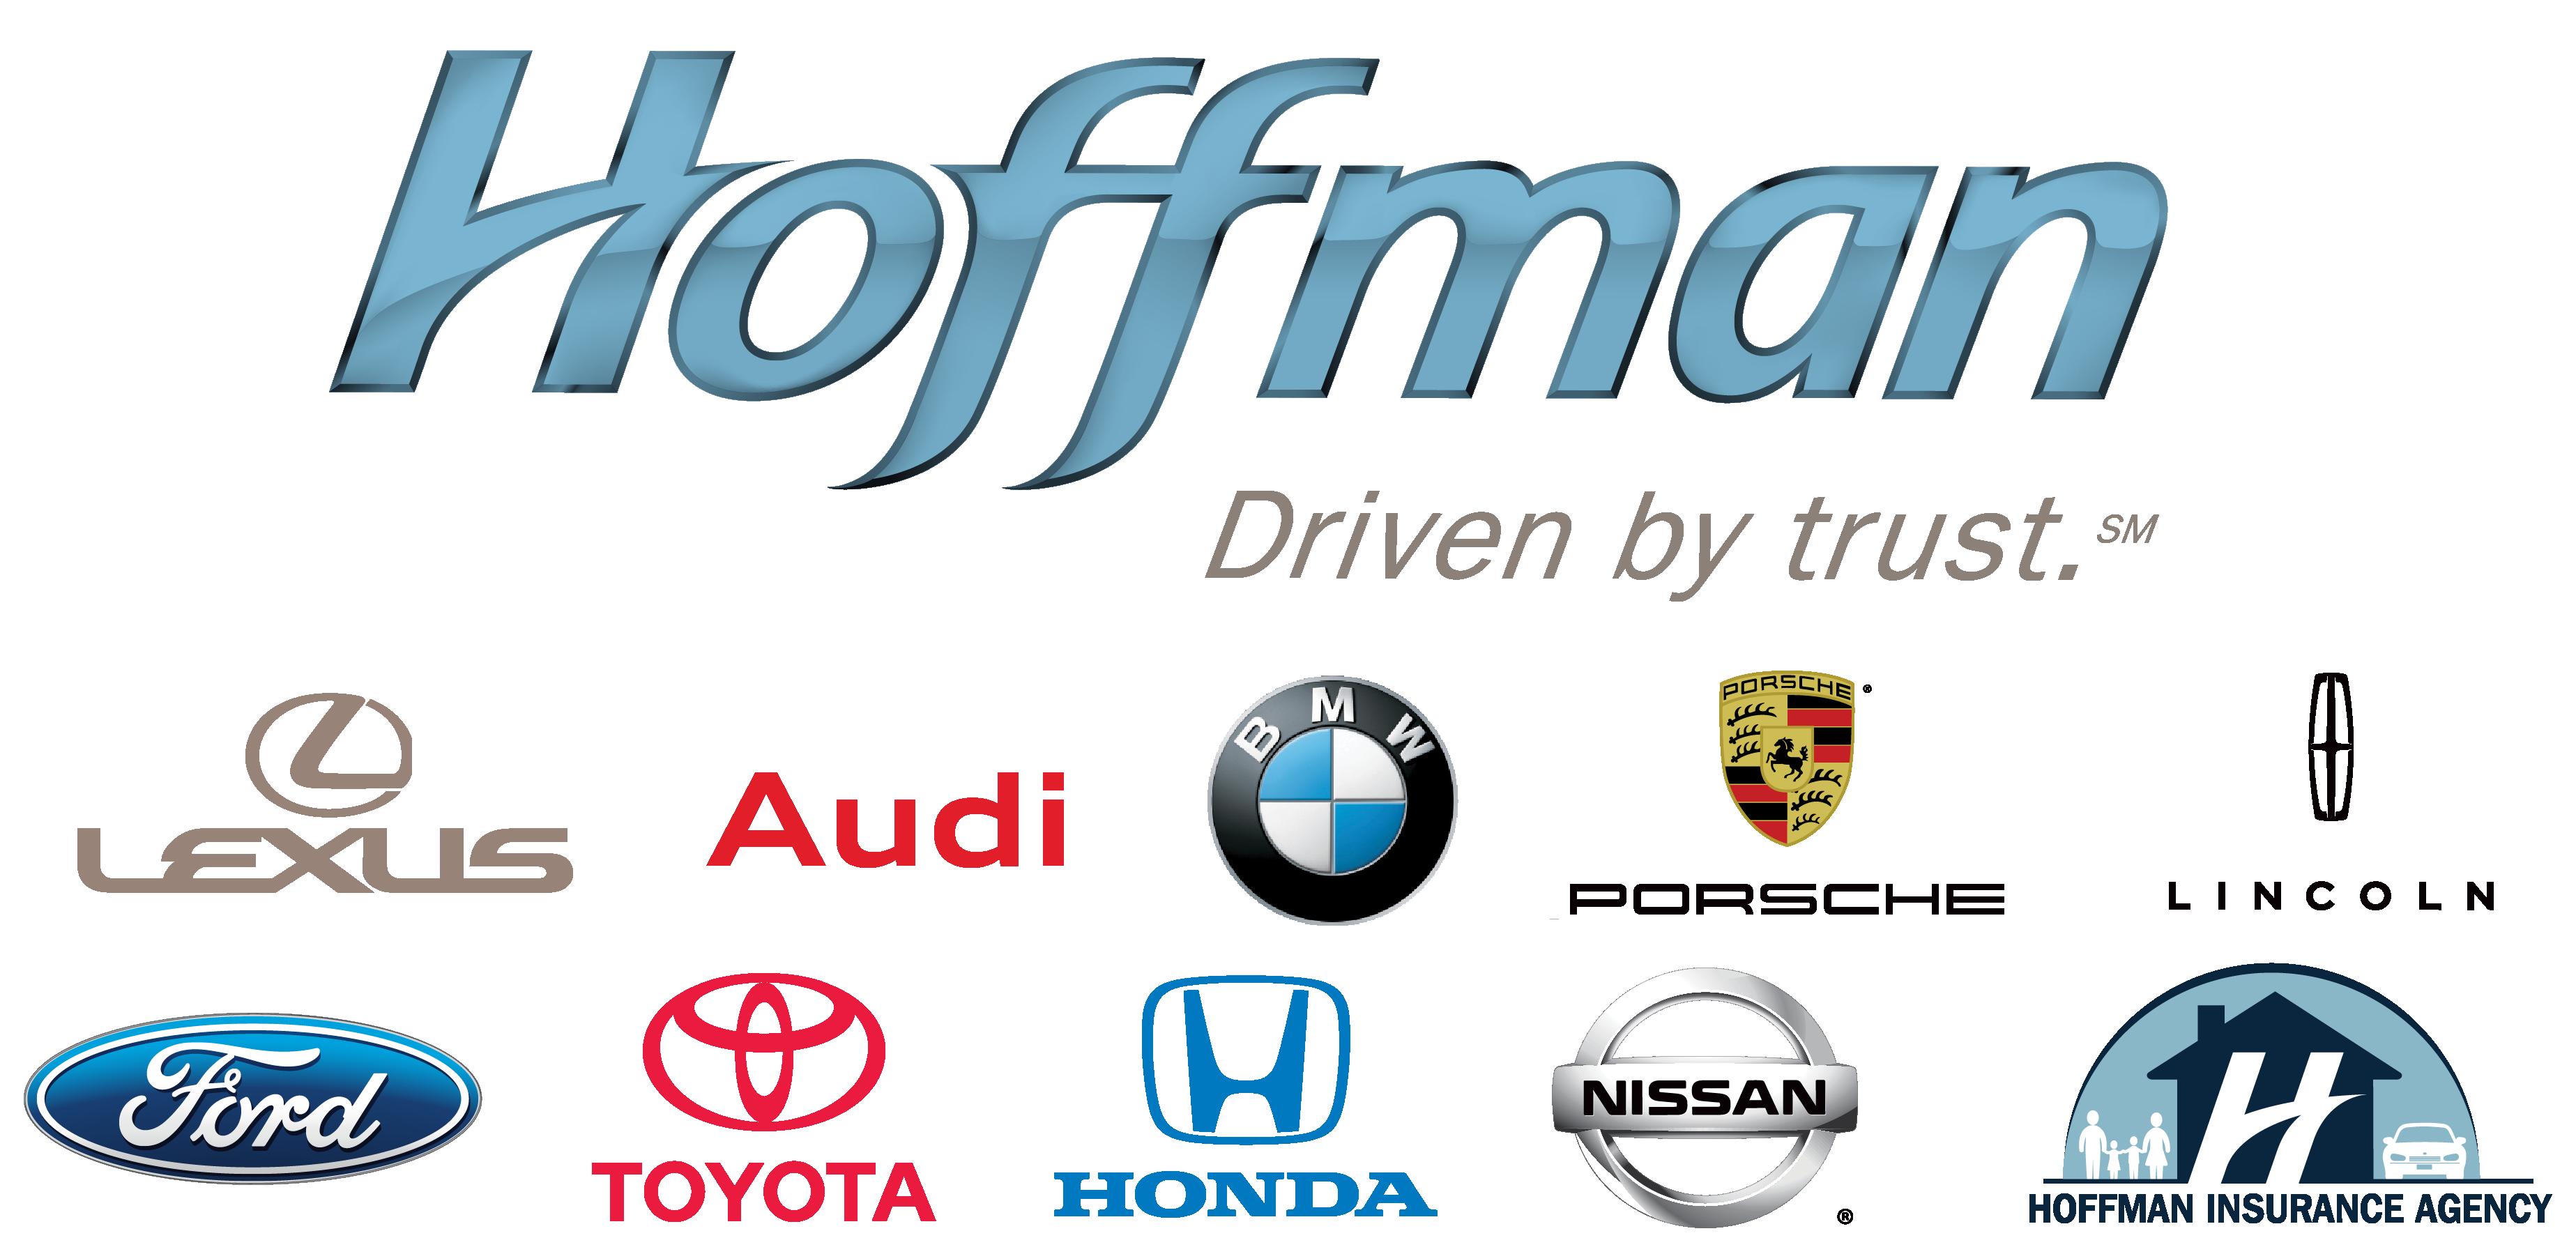 Hoffman Auto Group Used Cars Cars Image 2018